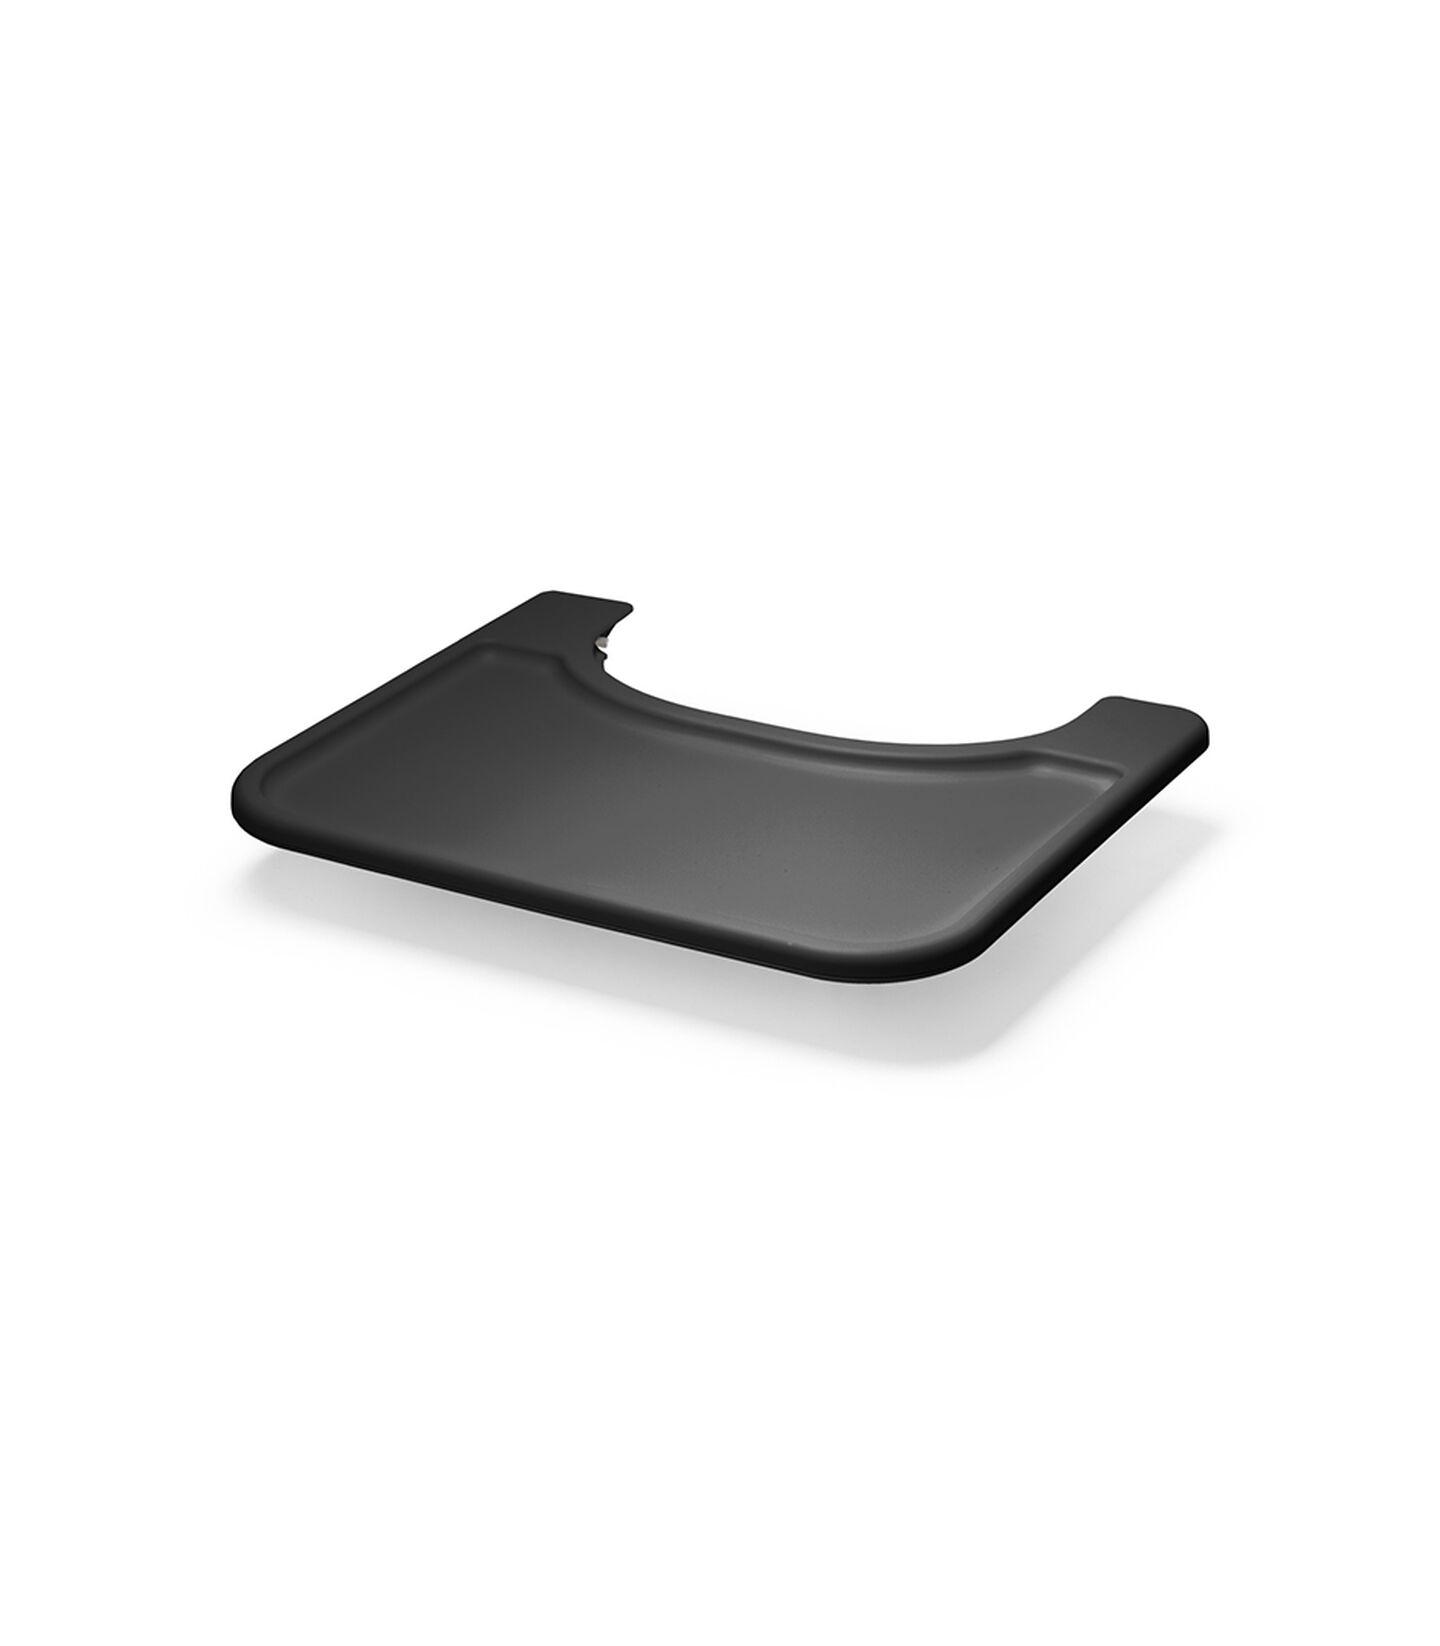 Поднос Stokke® Steps™, чёрный, Черный, mainview view 2